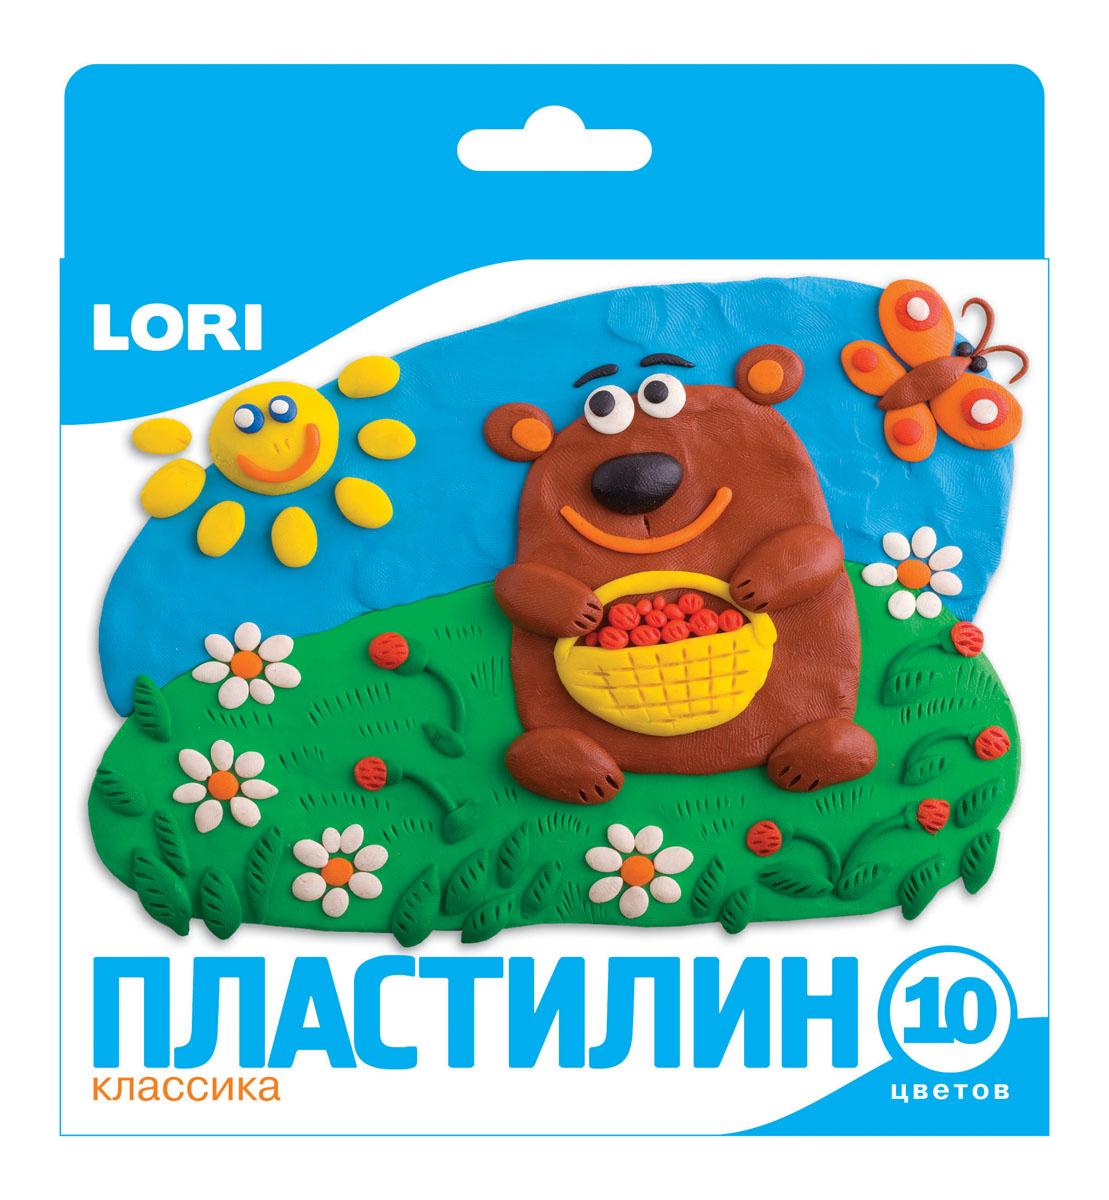 Lori Пластилин Классика